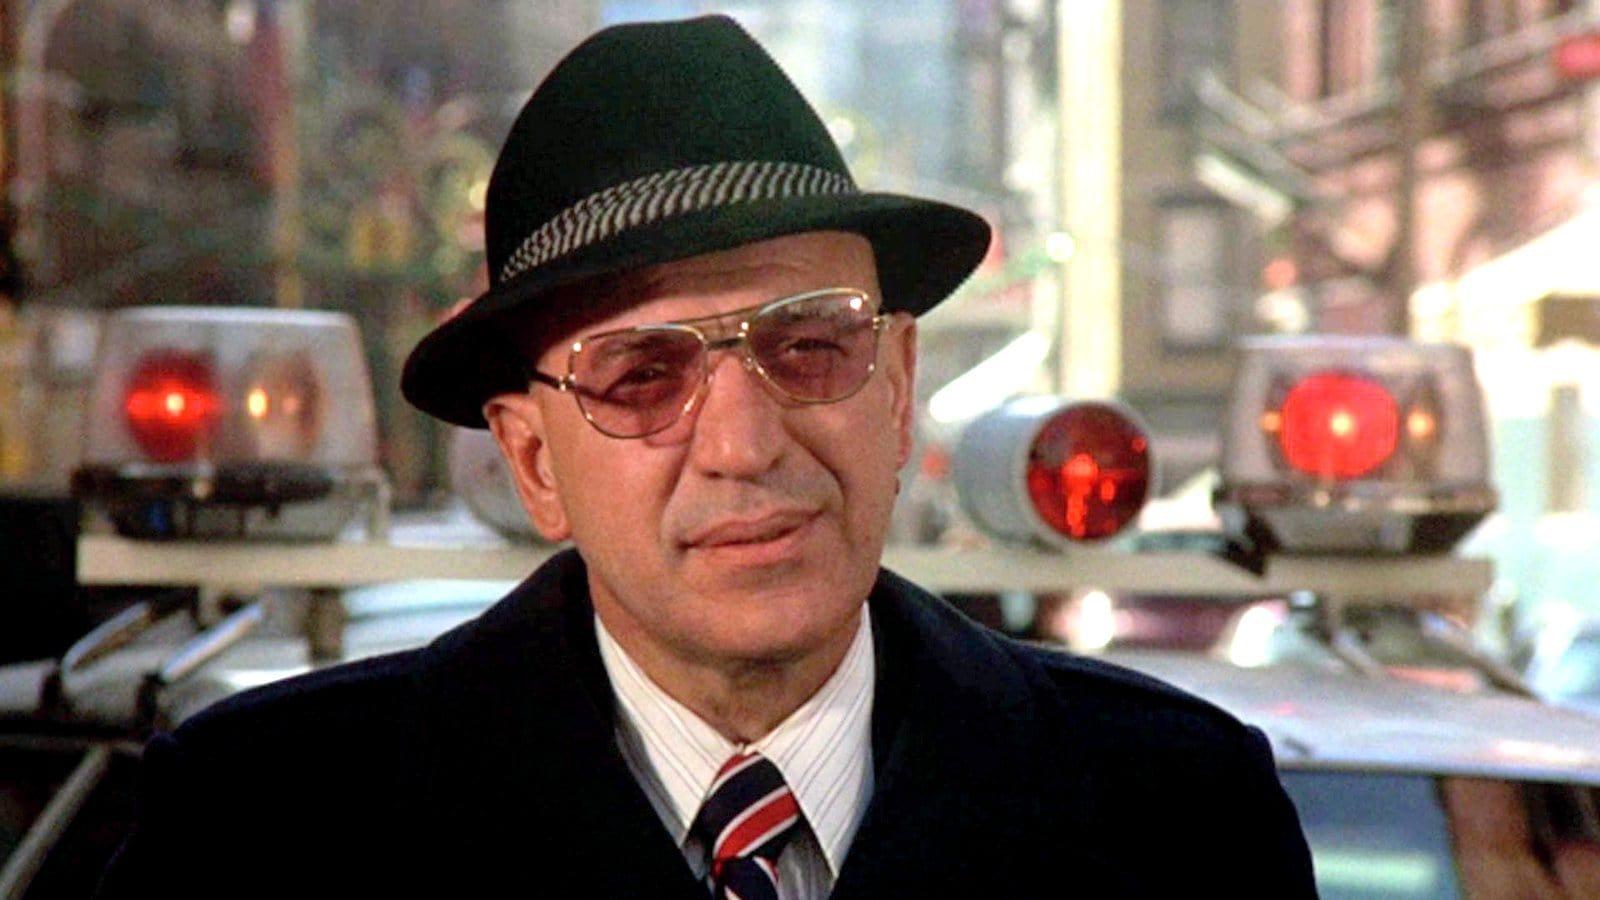 Telly Savalas as Kojak - New York street scene with flashing lights